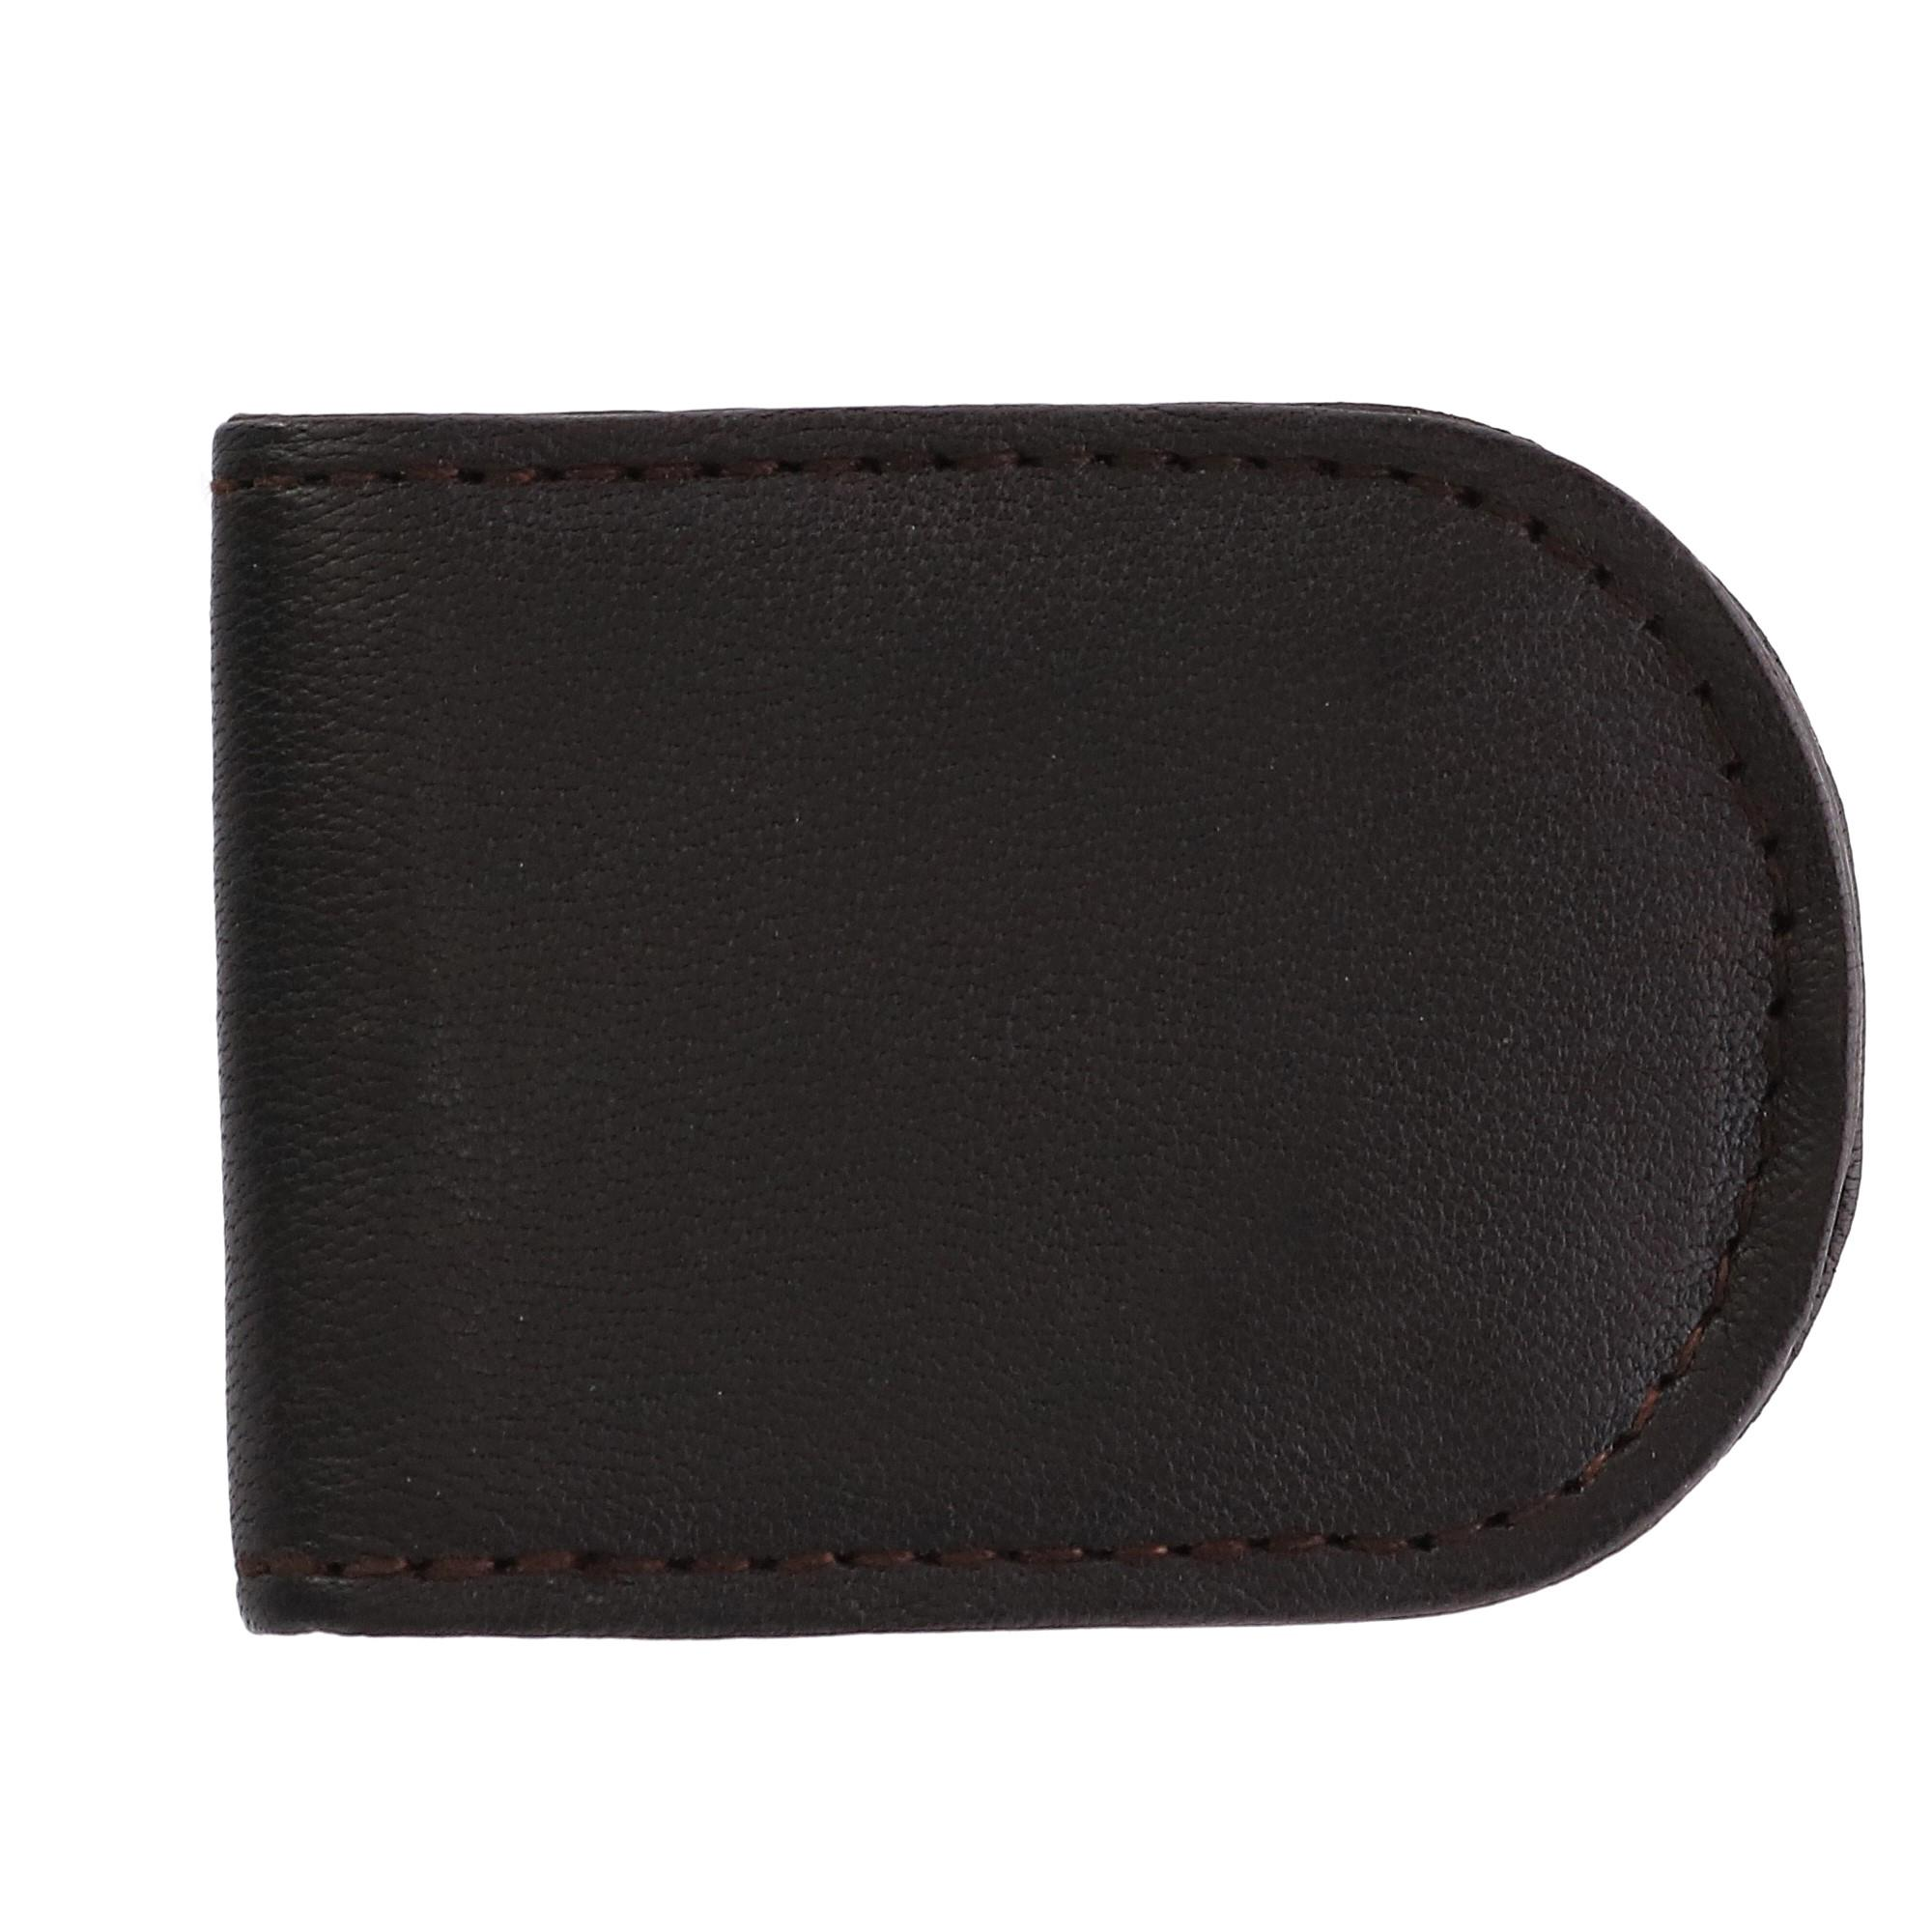 CTM Men's Basic Leather Money Clip